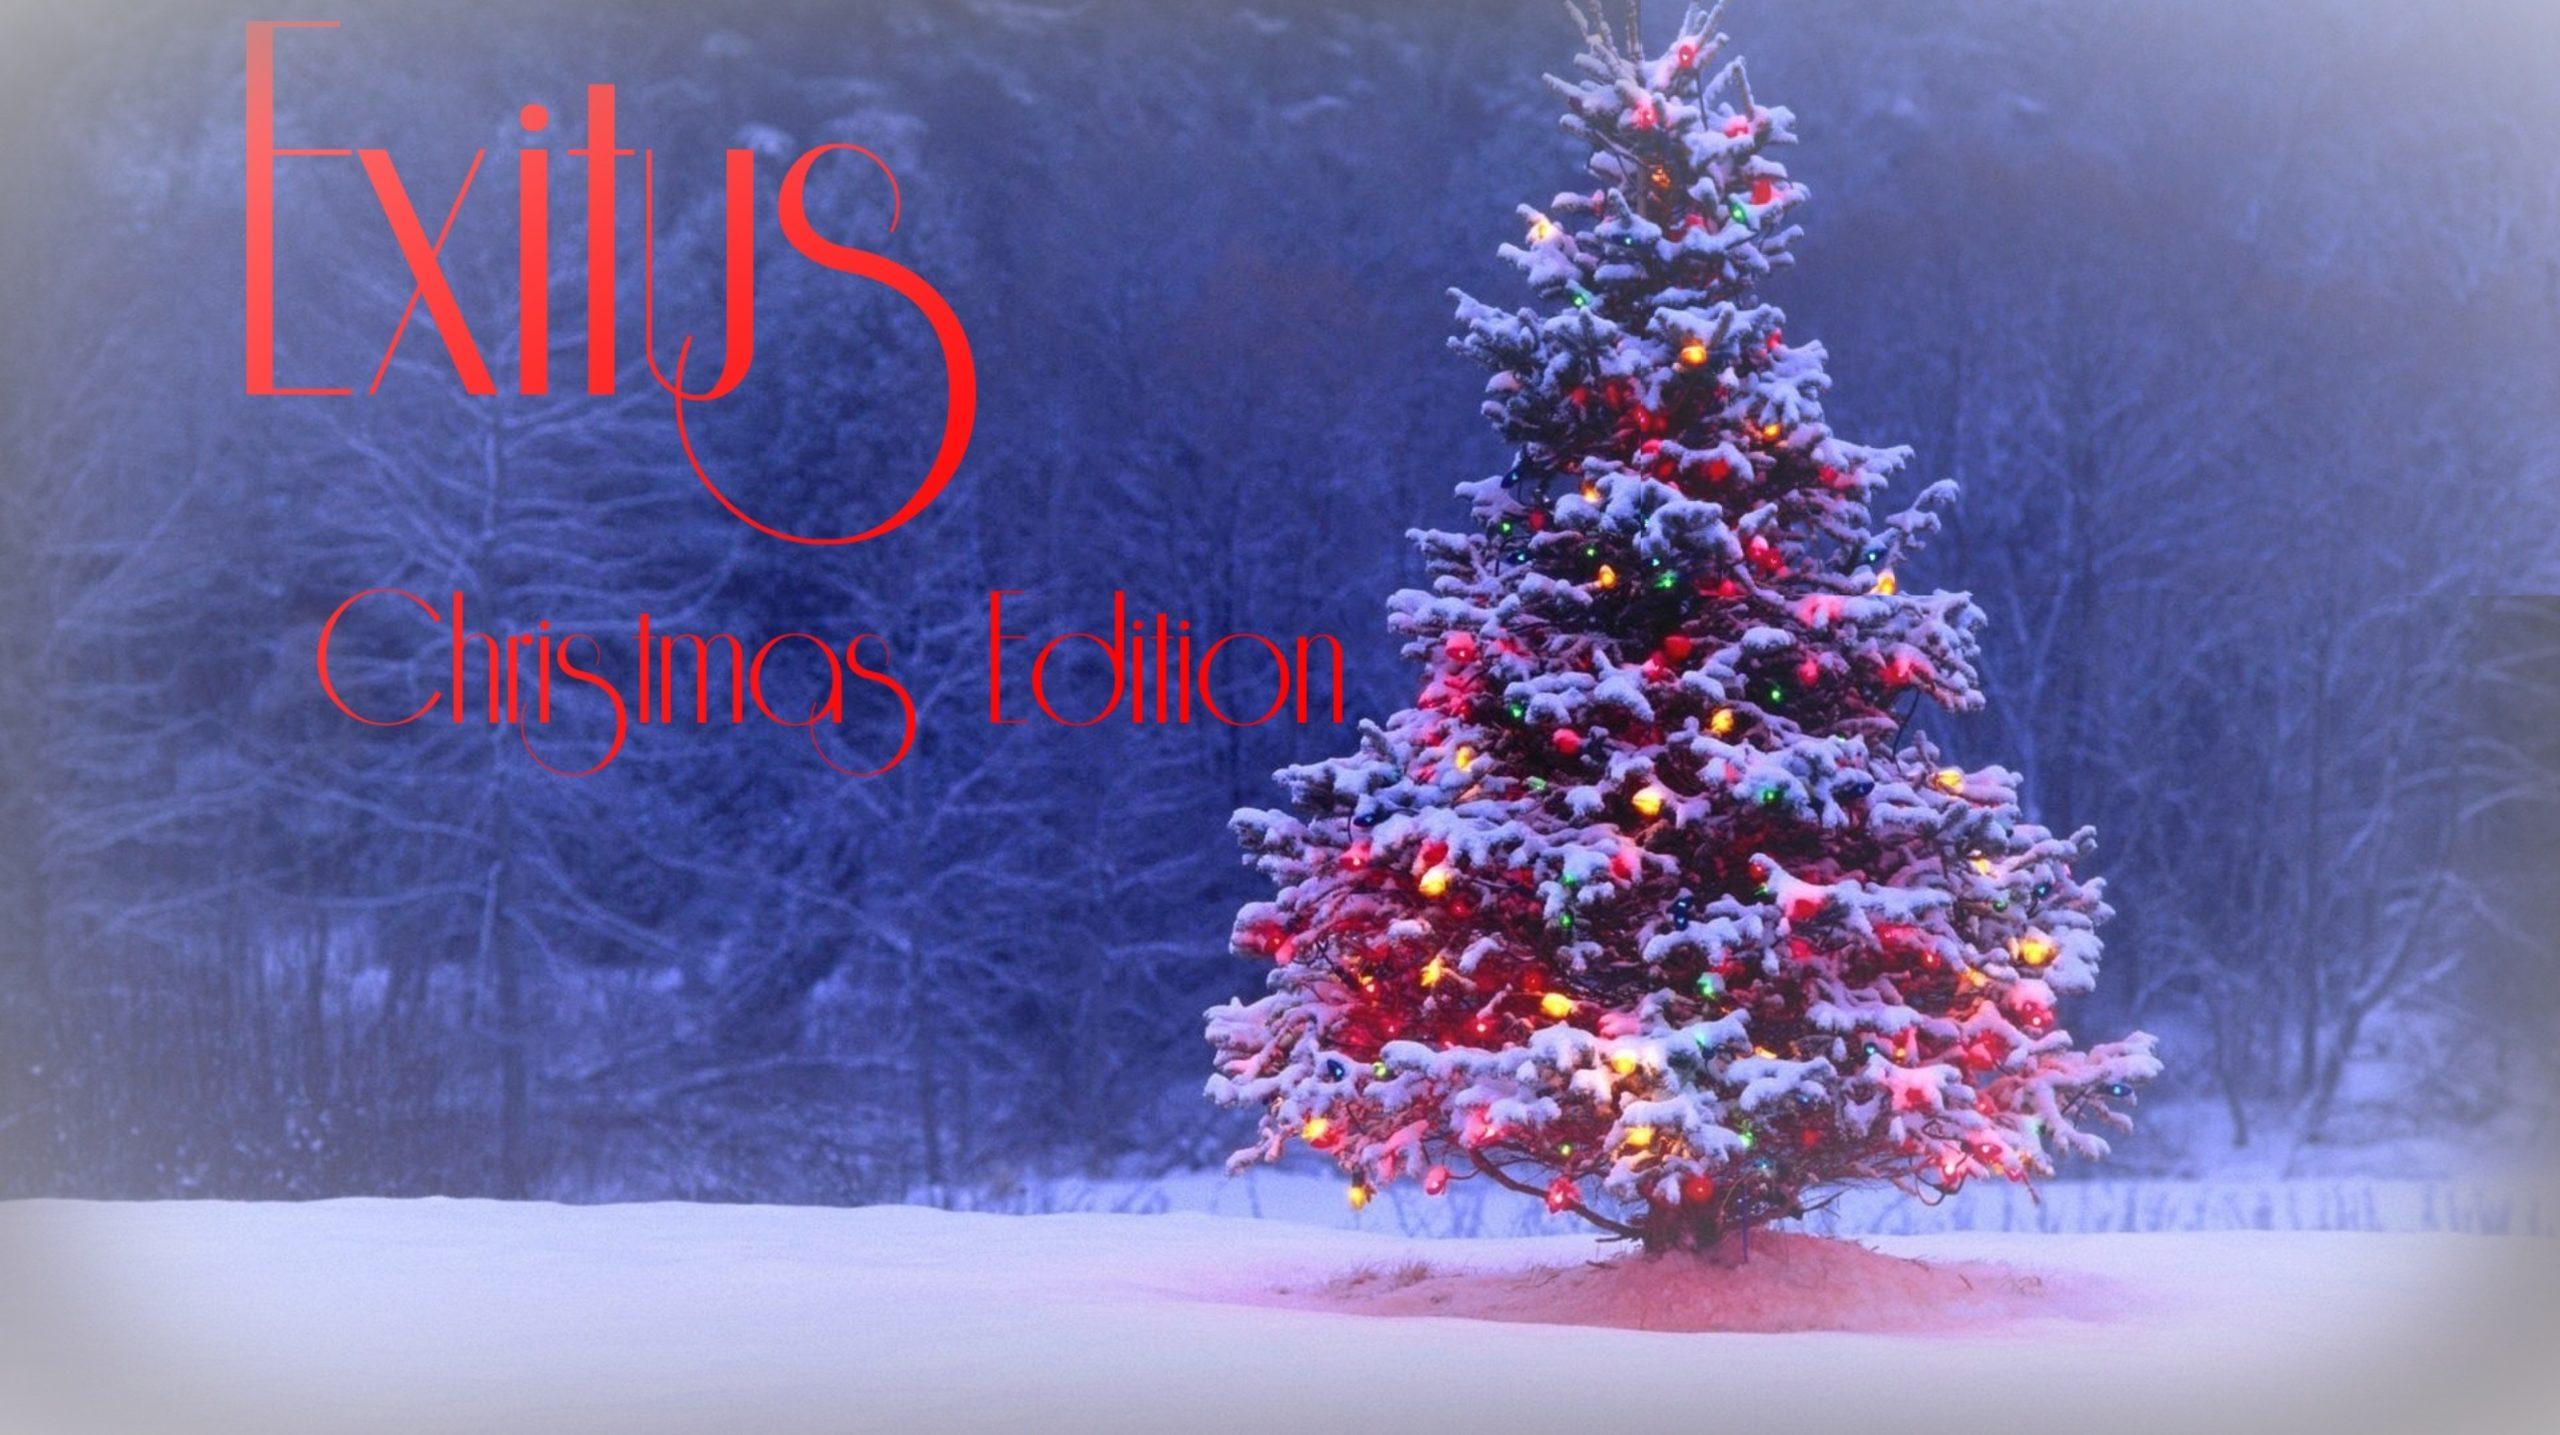 Exitus-Christmas Edition